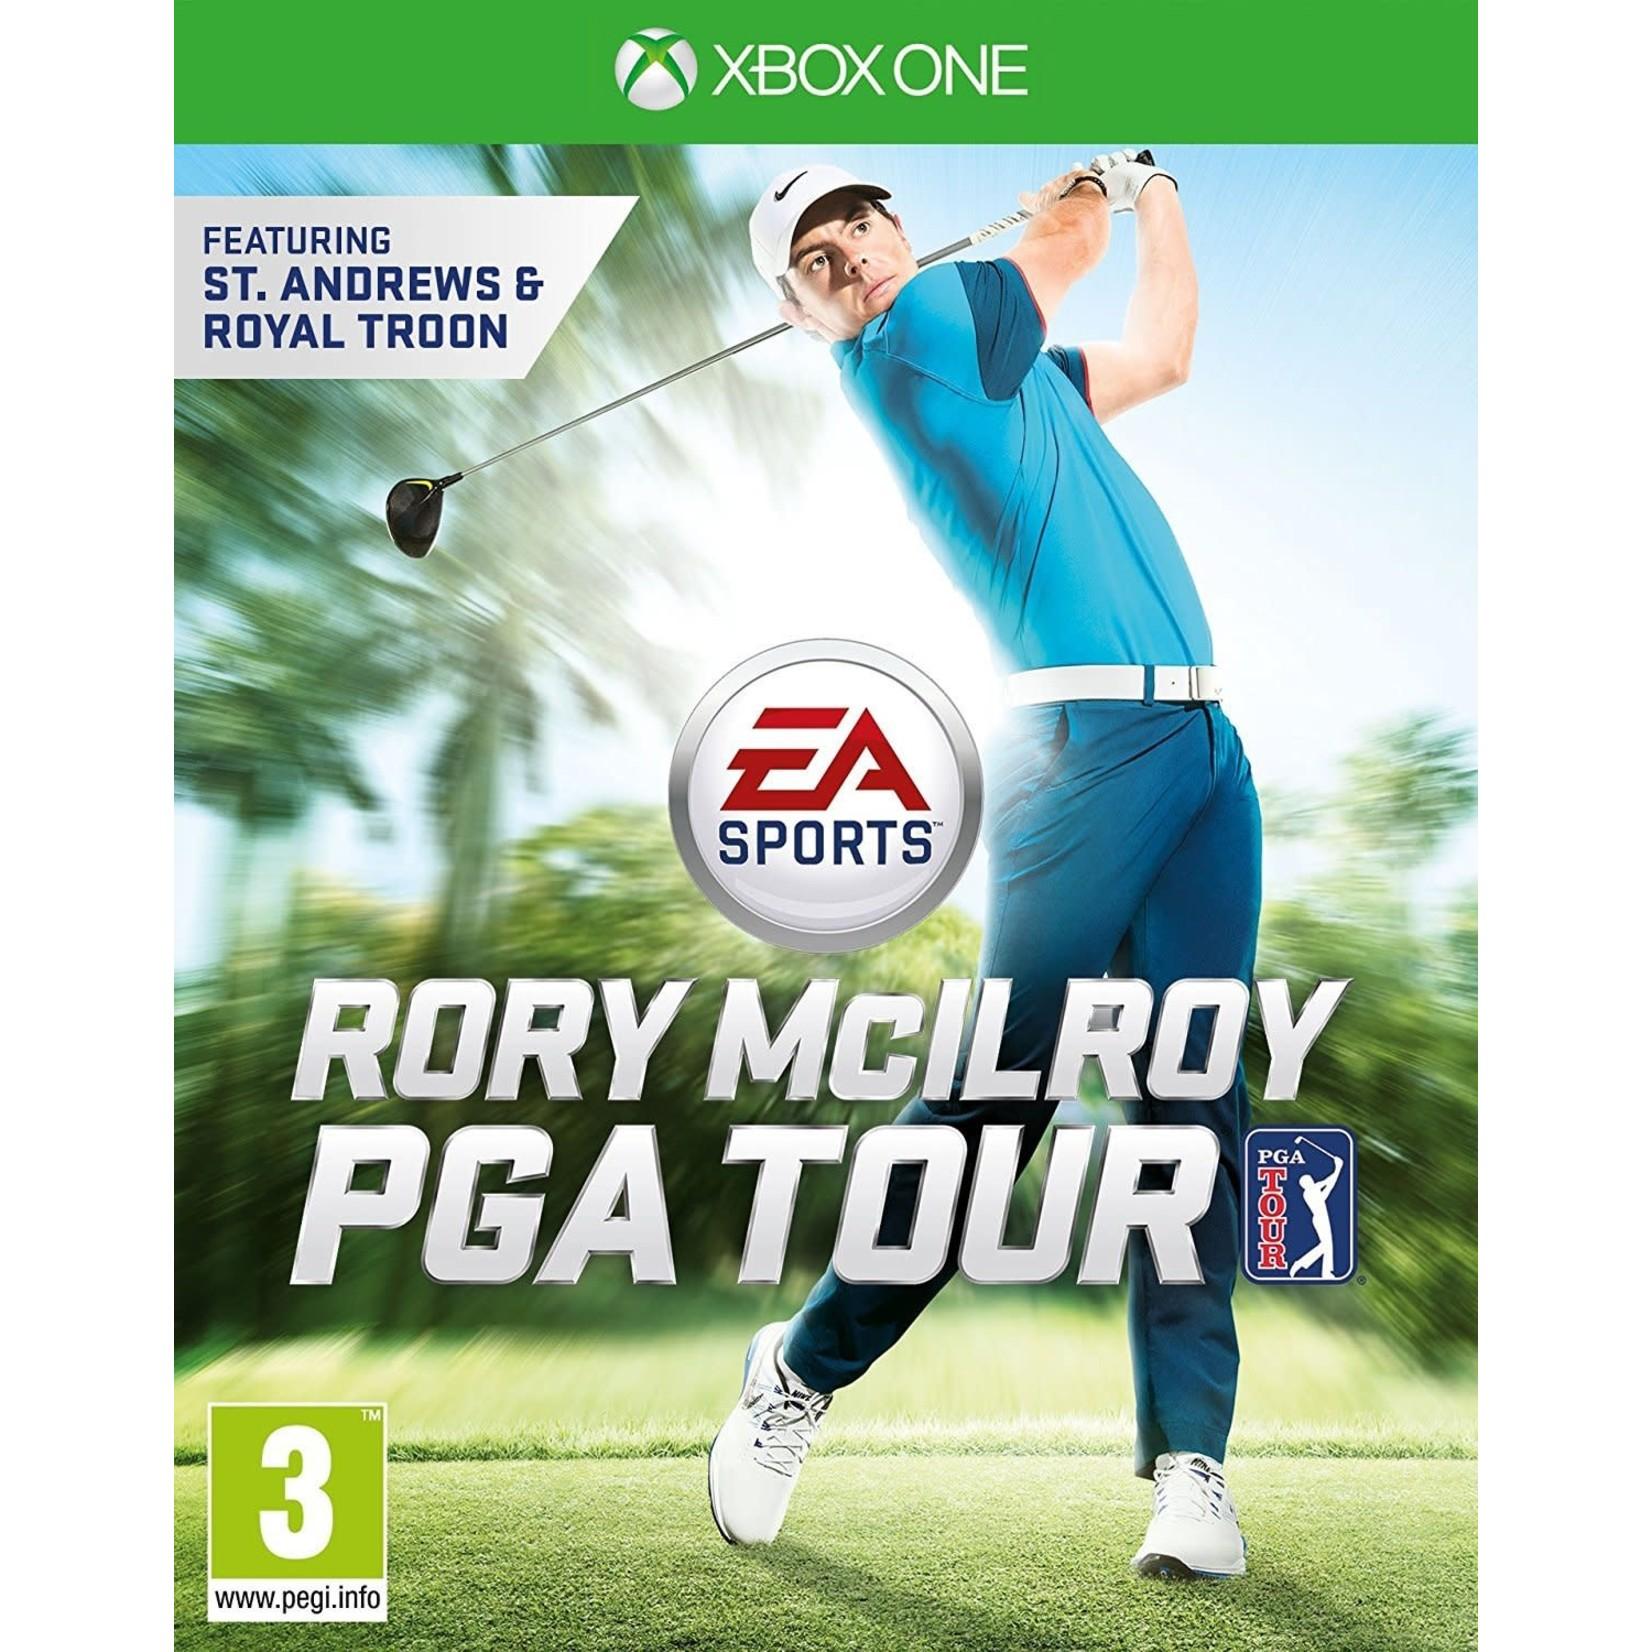 XB1U-EA SPORTS Rory McIlroy PGA Tour